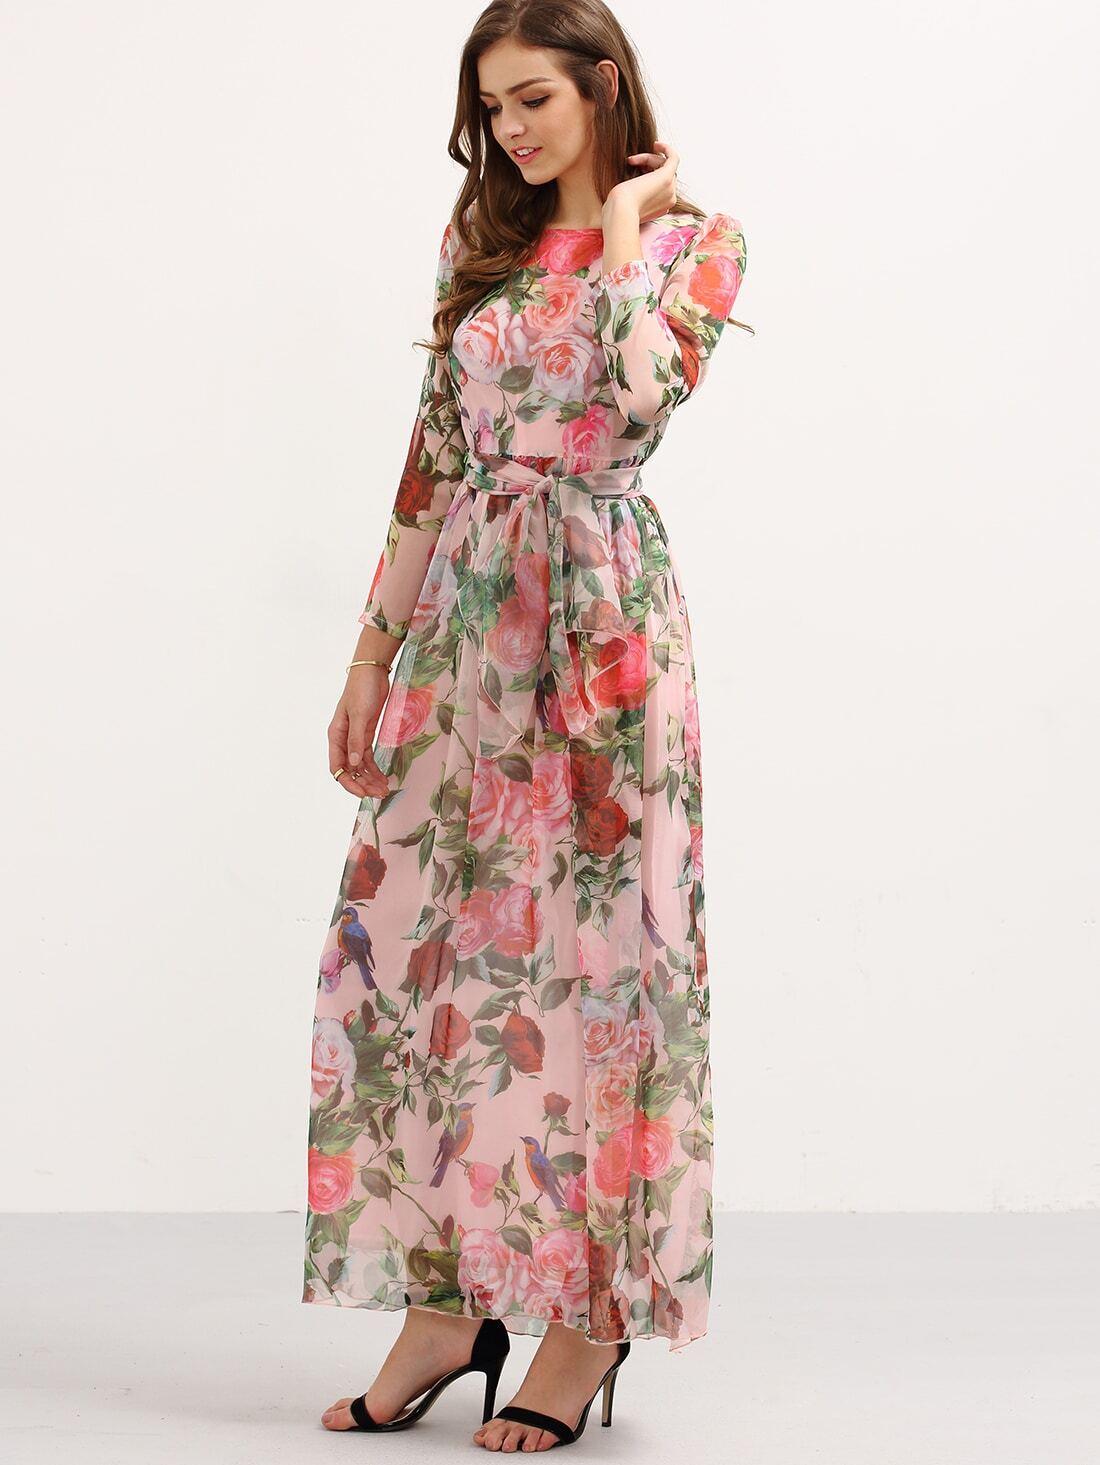 8e44d00bc2717 Self-Tie Rose Print Long Sleeve Chiffon Dress - Pink EmmaCloth-Women Fast  Fashion Online